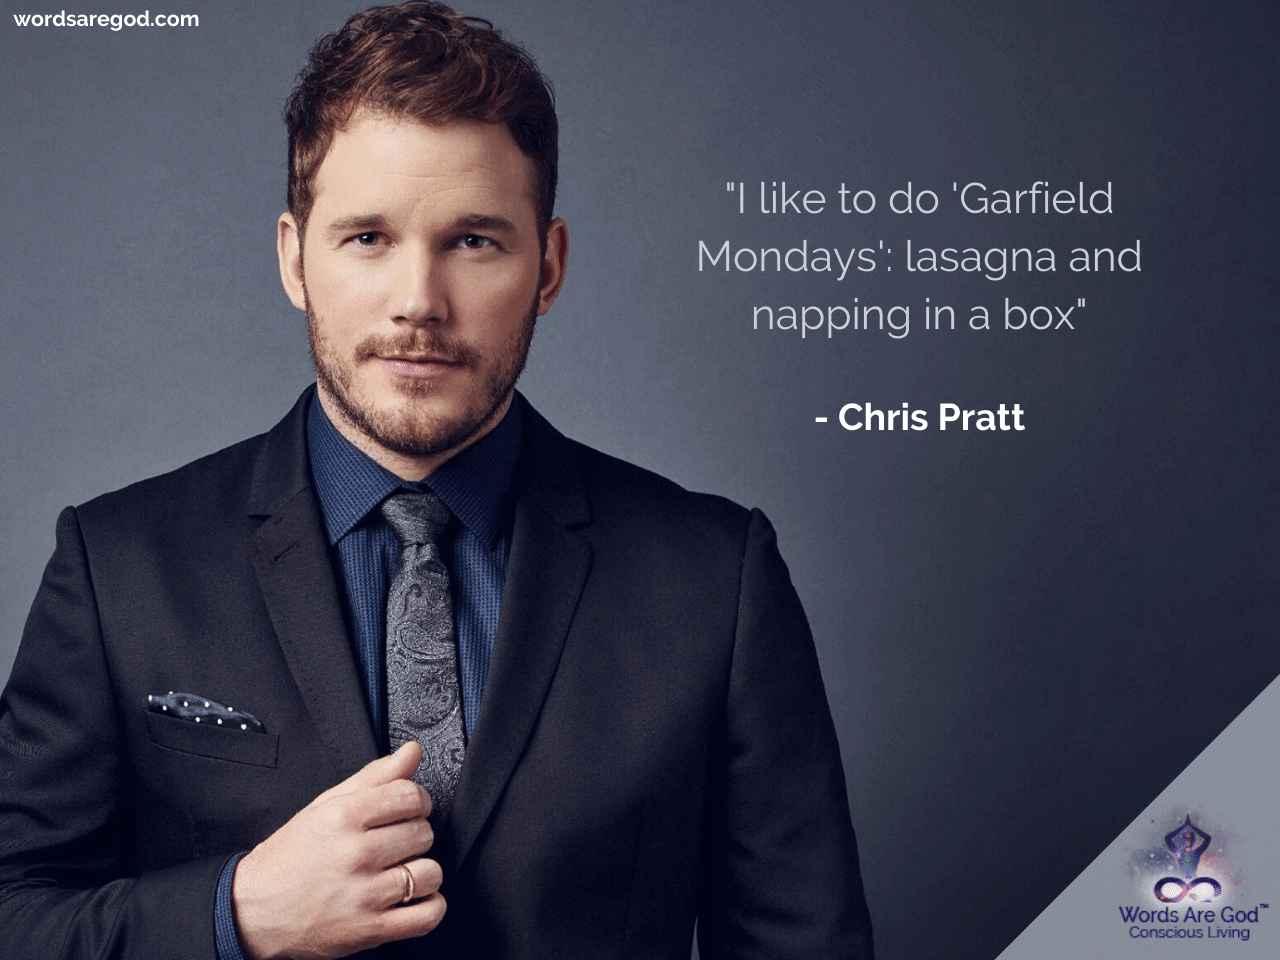 Chris Pratt Motivational Quote